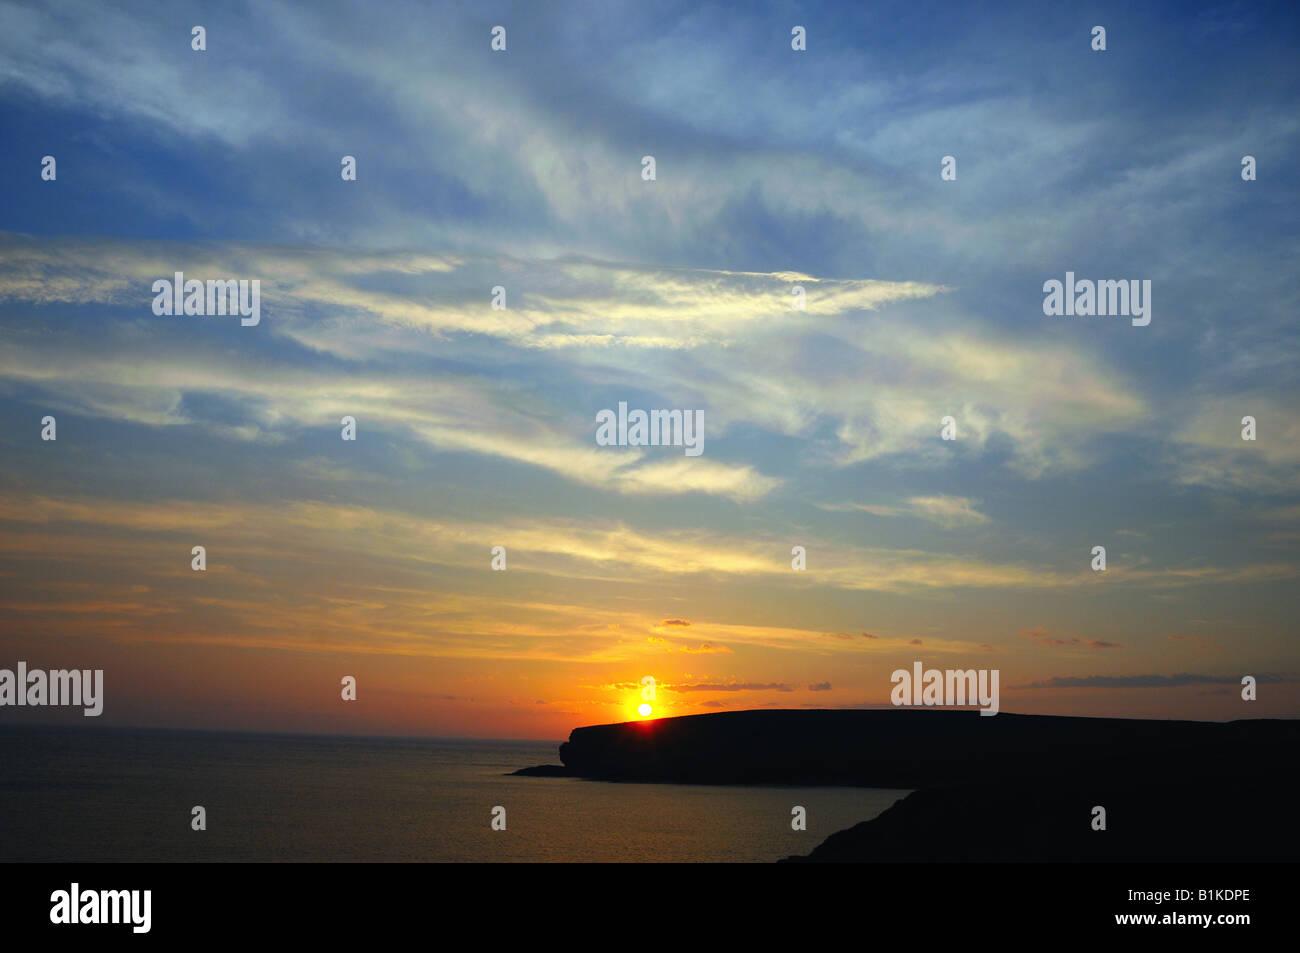 Sunset at the Atlantic coast of Ireland. County Clare, Ireland. - Stock Image